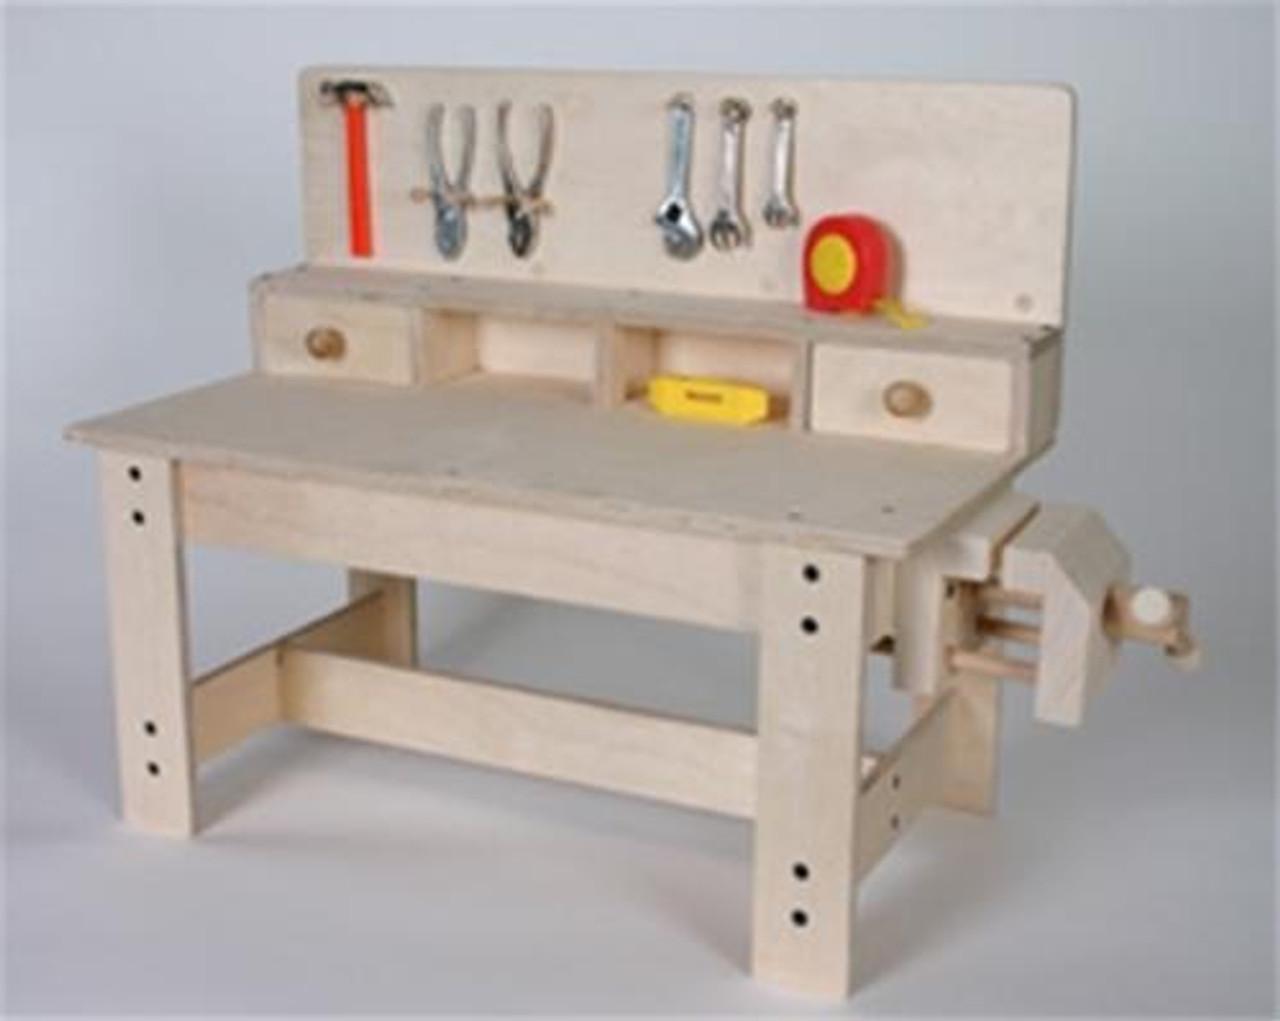 Cherry Tree Toys Workbench Plan